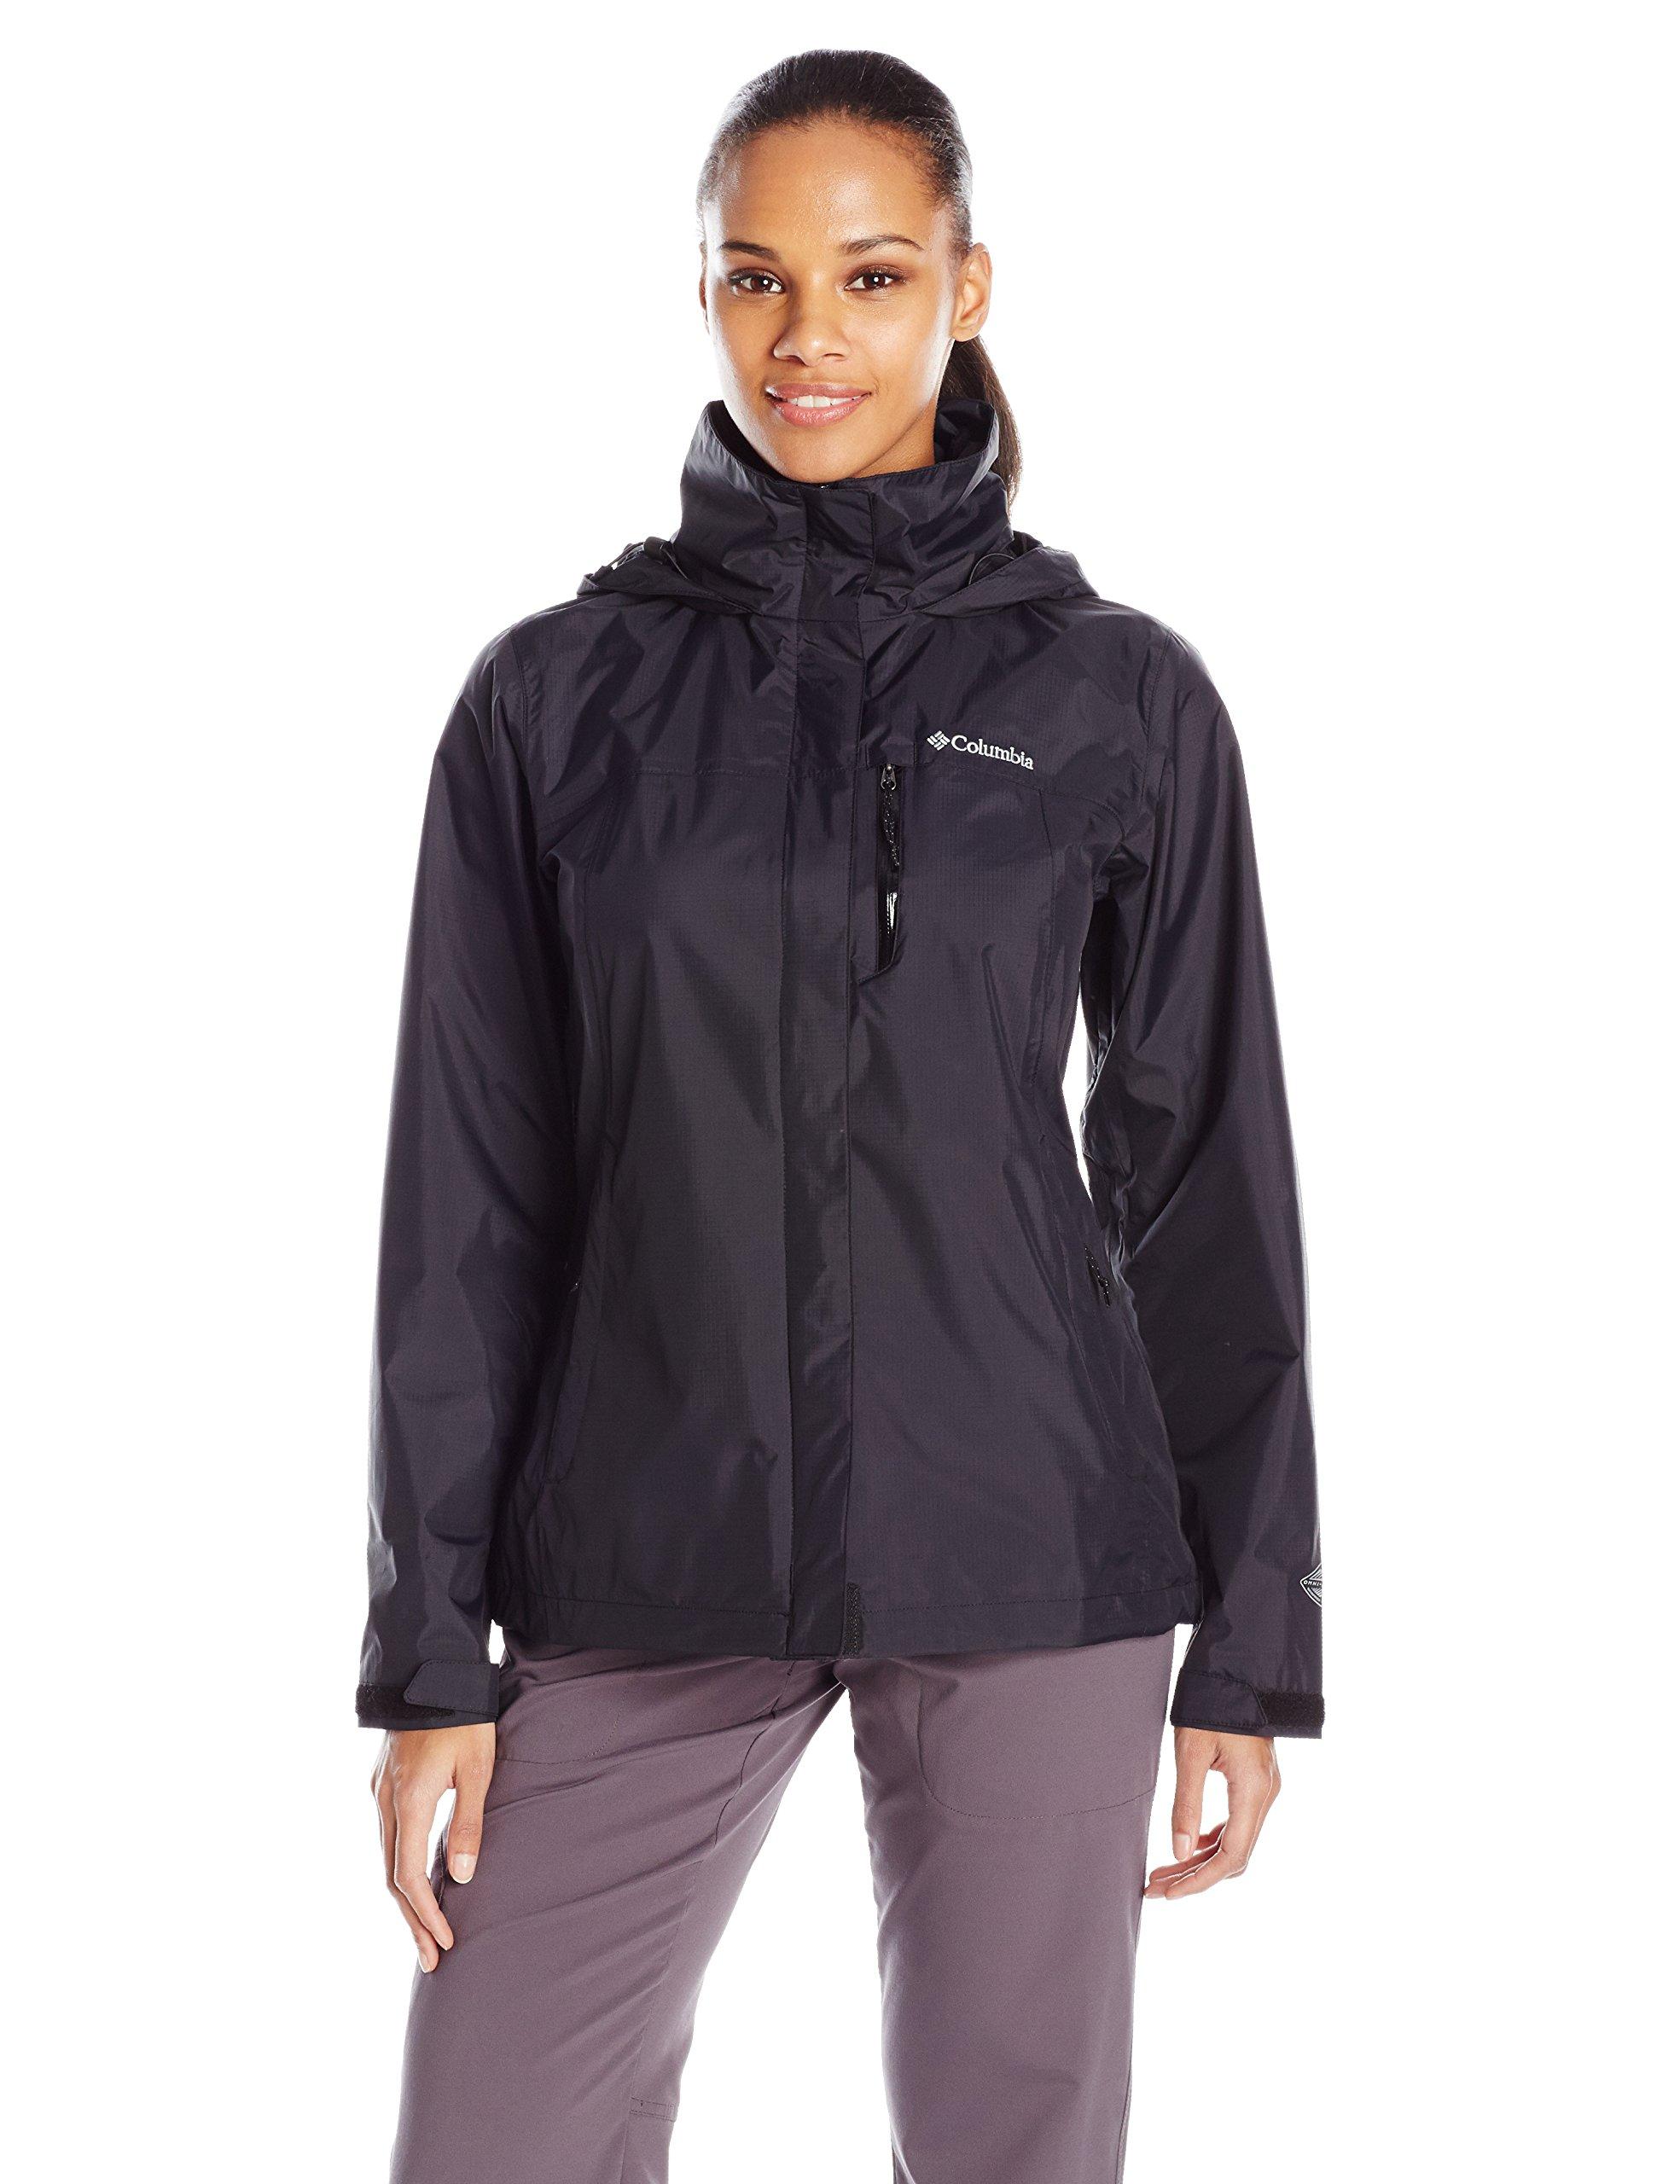 Columbia Women's Pouration Waterproof Rain Jacket, Medium, Black by Columbia (Image #1)